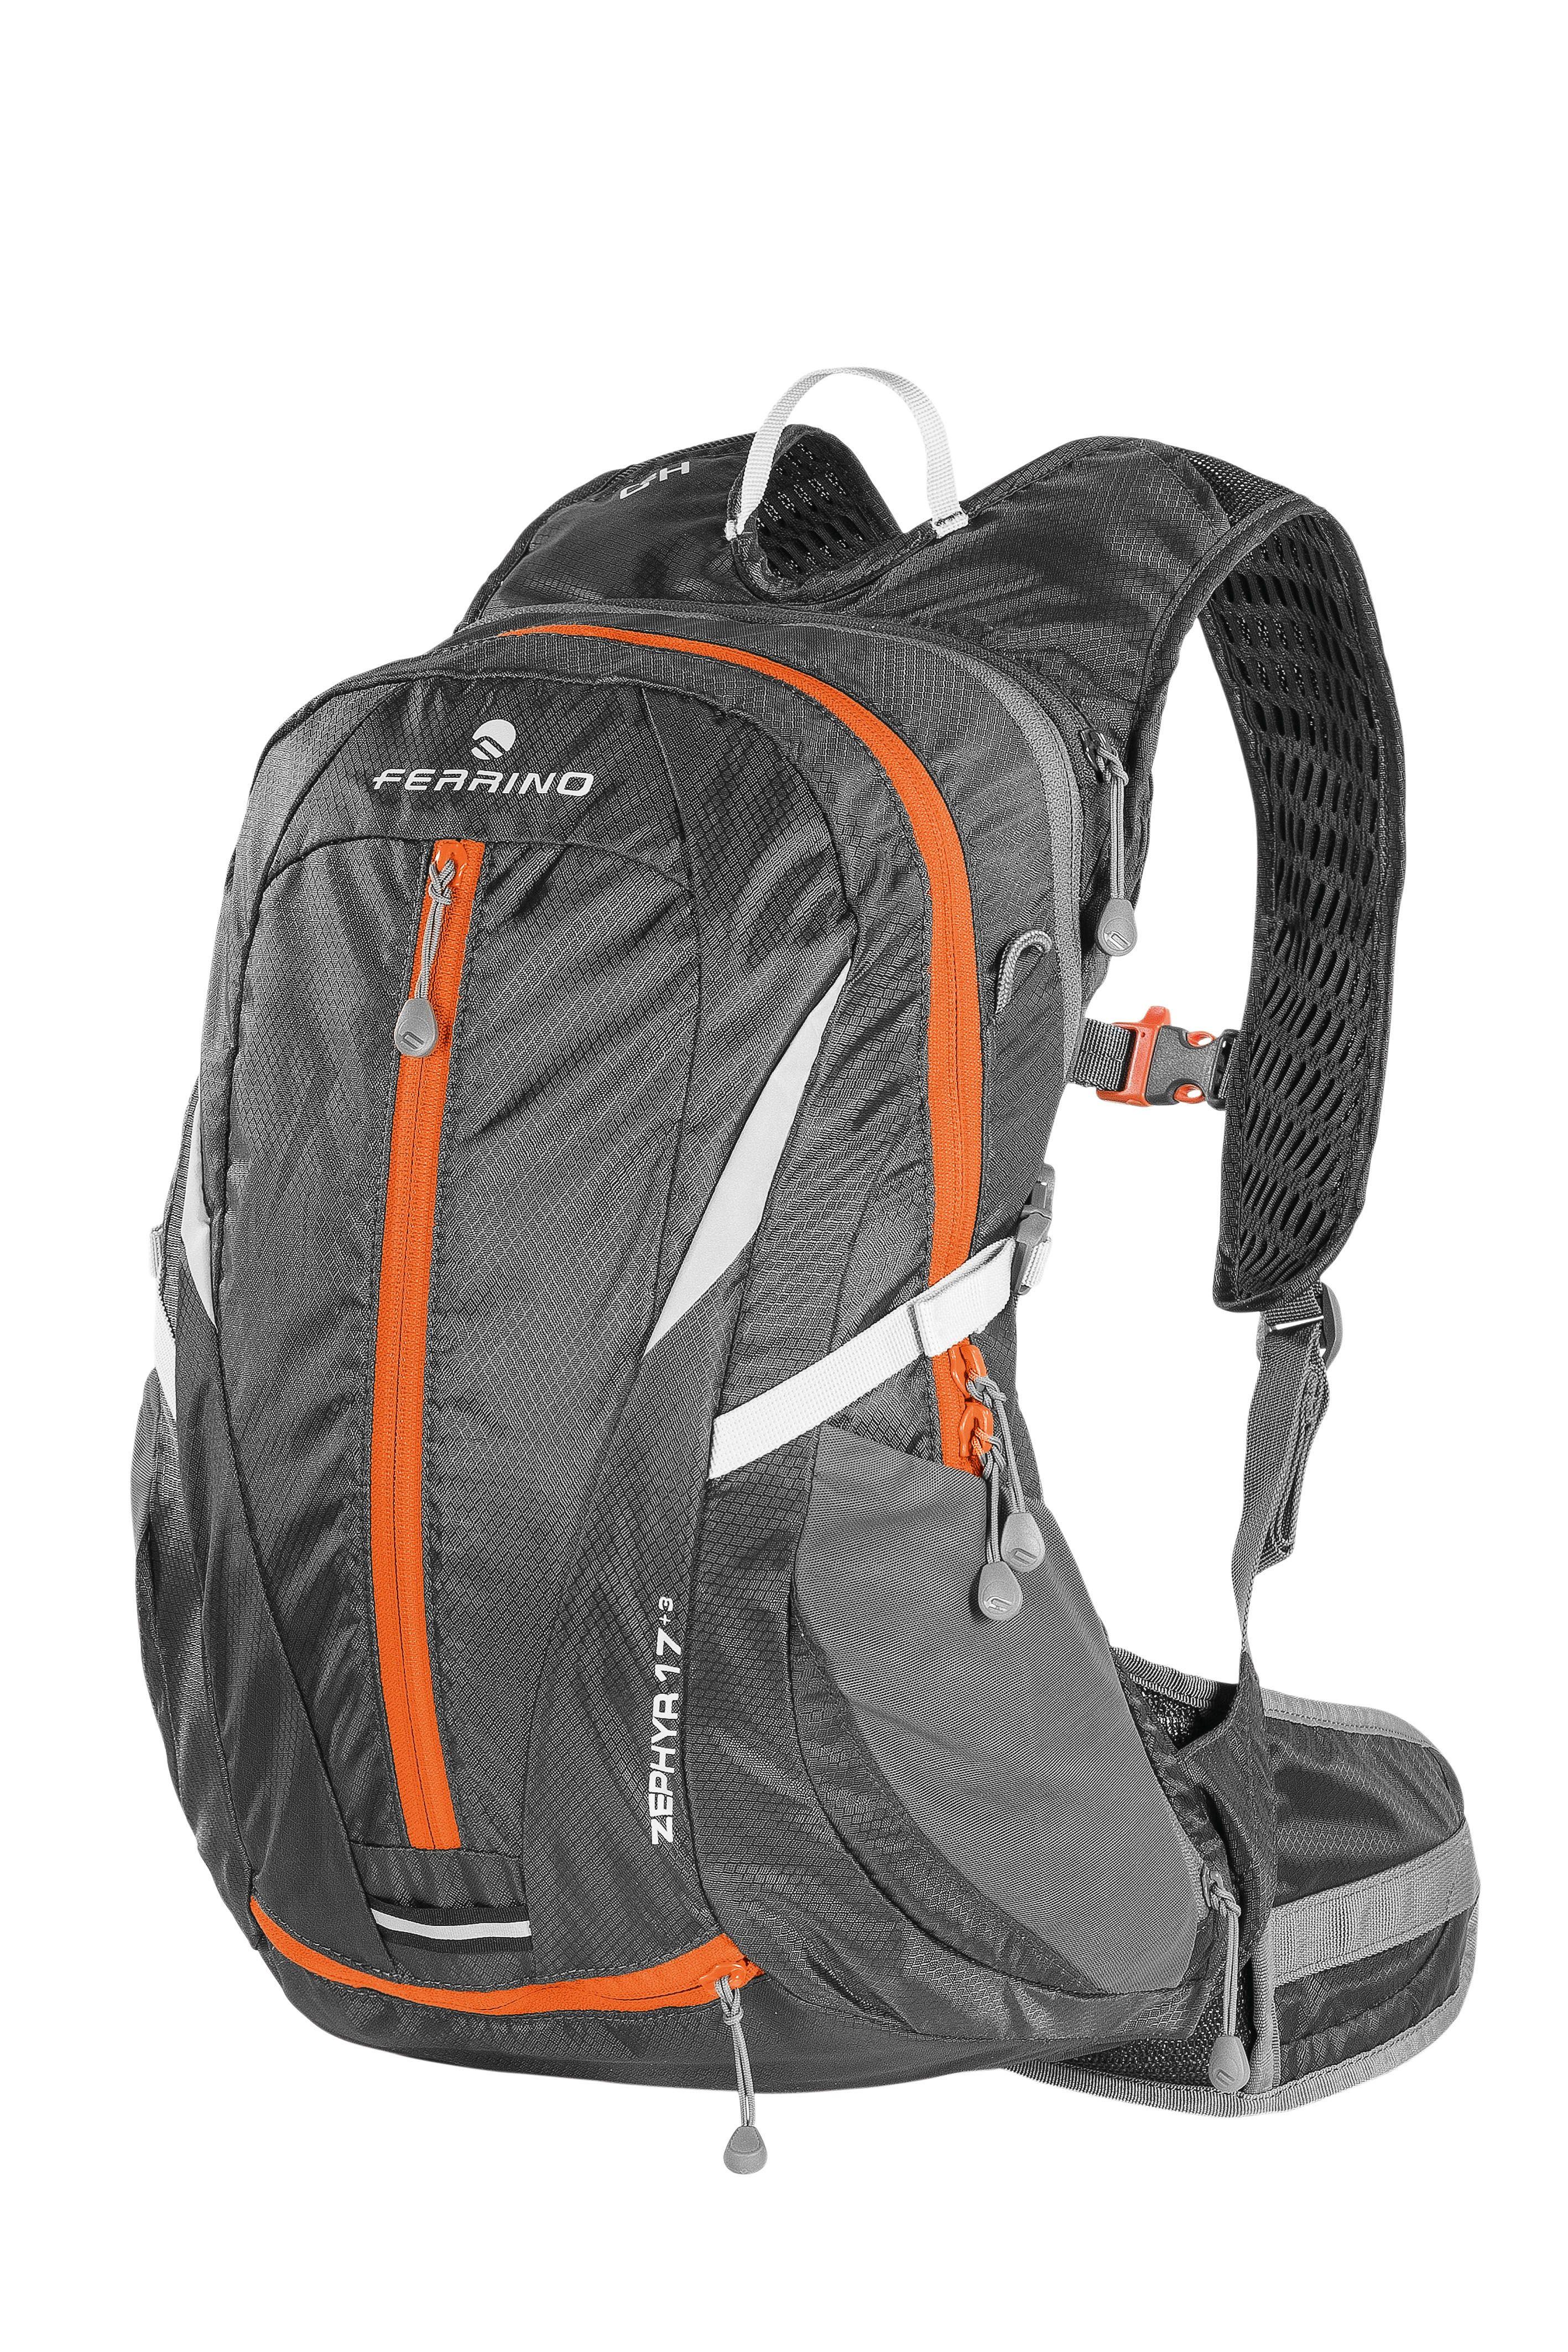 sports shoes 0823c c4b06 Pin de Guido Meak en Stuff   Backpacks, Golf bags y North face backpack